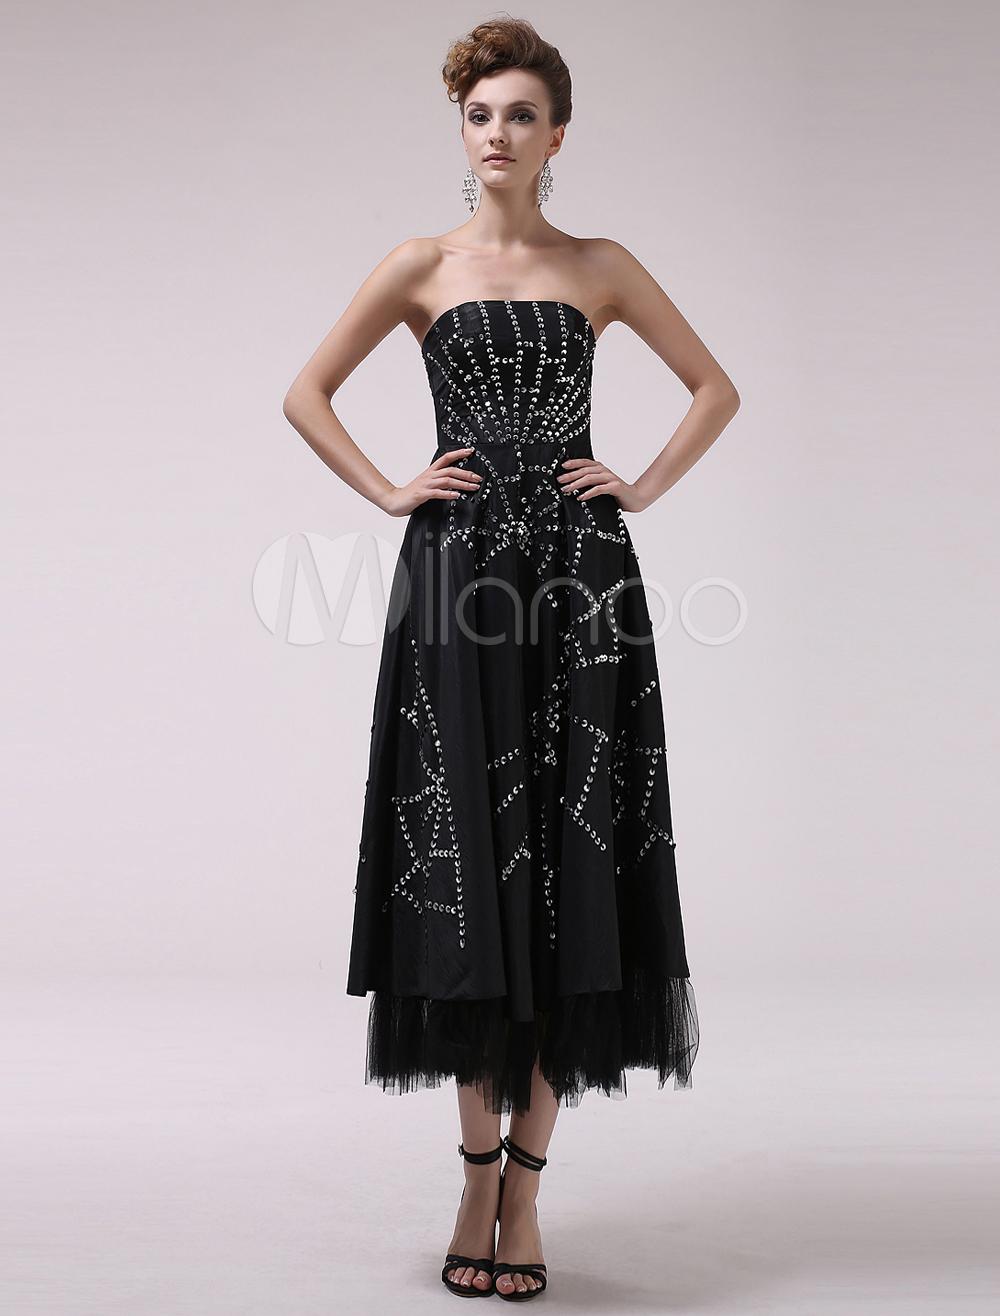 Sexy Black Strapless Beading A-line Sleeveless Taffeta Cocktail Dress Milanoo